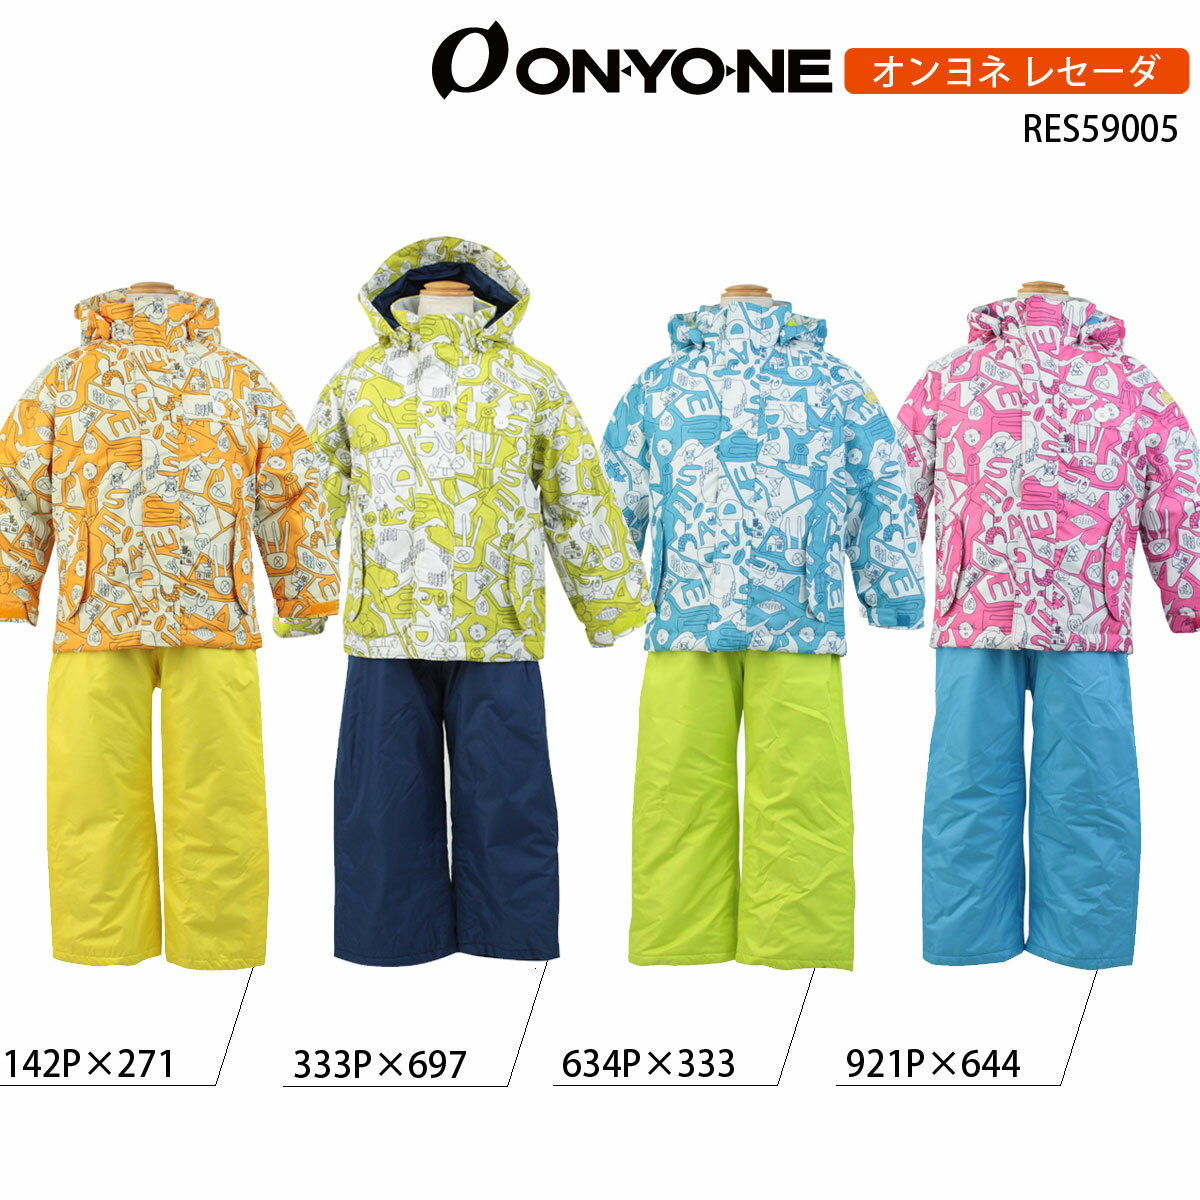 ONYONE RESEEDA(オンヨネ レセーダ) RES59005 子供用 キッズ トドラー スキーウェア 上下セット